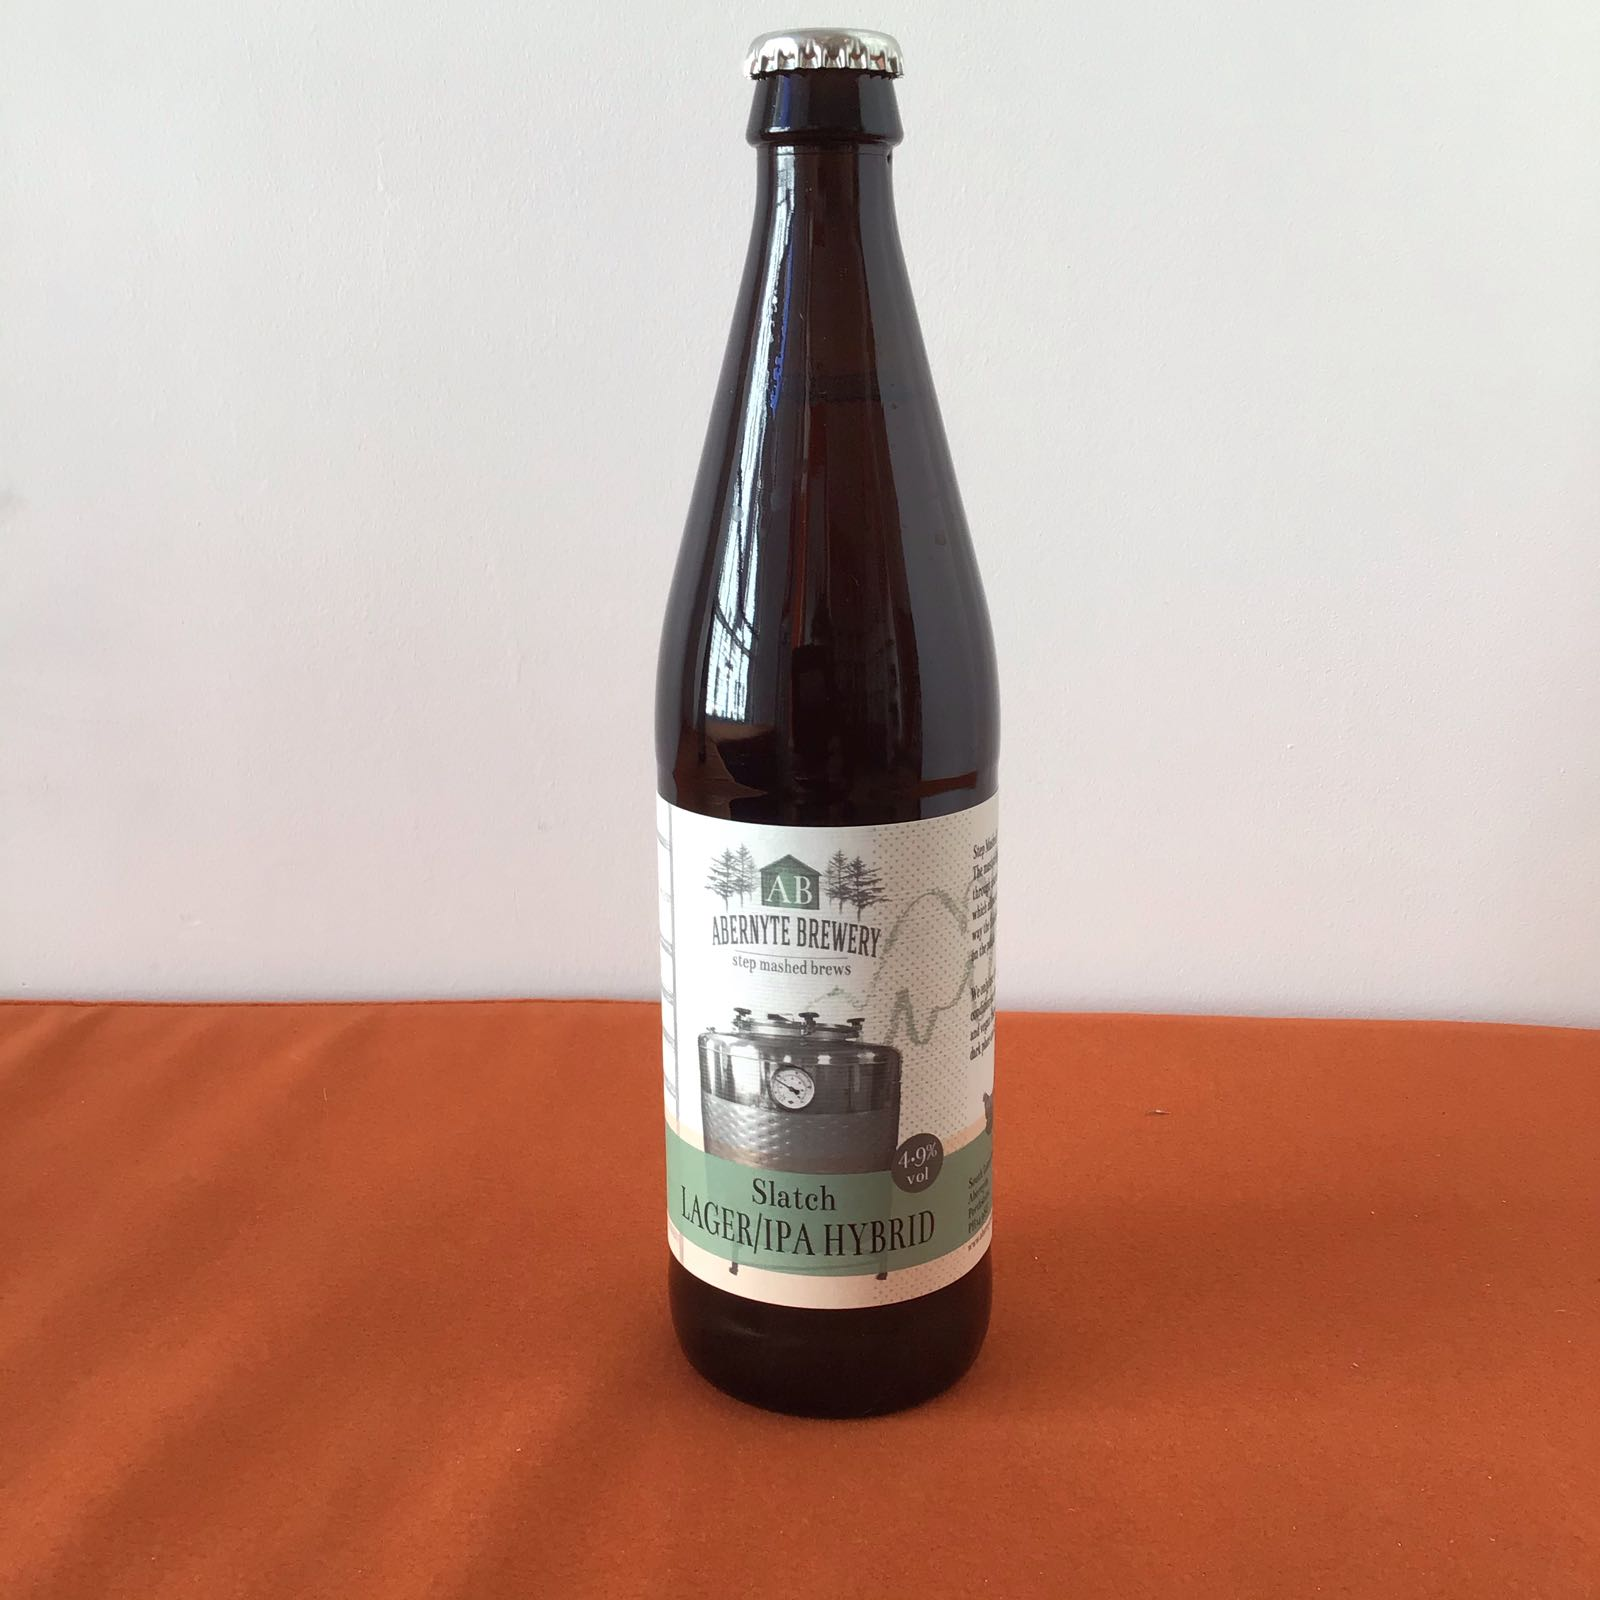 Abernyte Brewery: Slatch(Lager / IPA Hybrid)